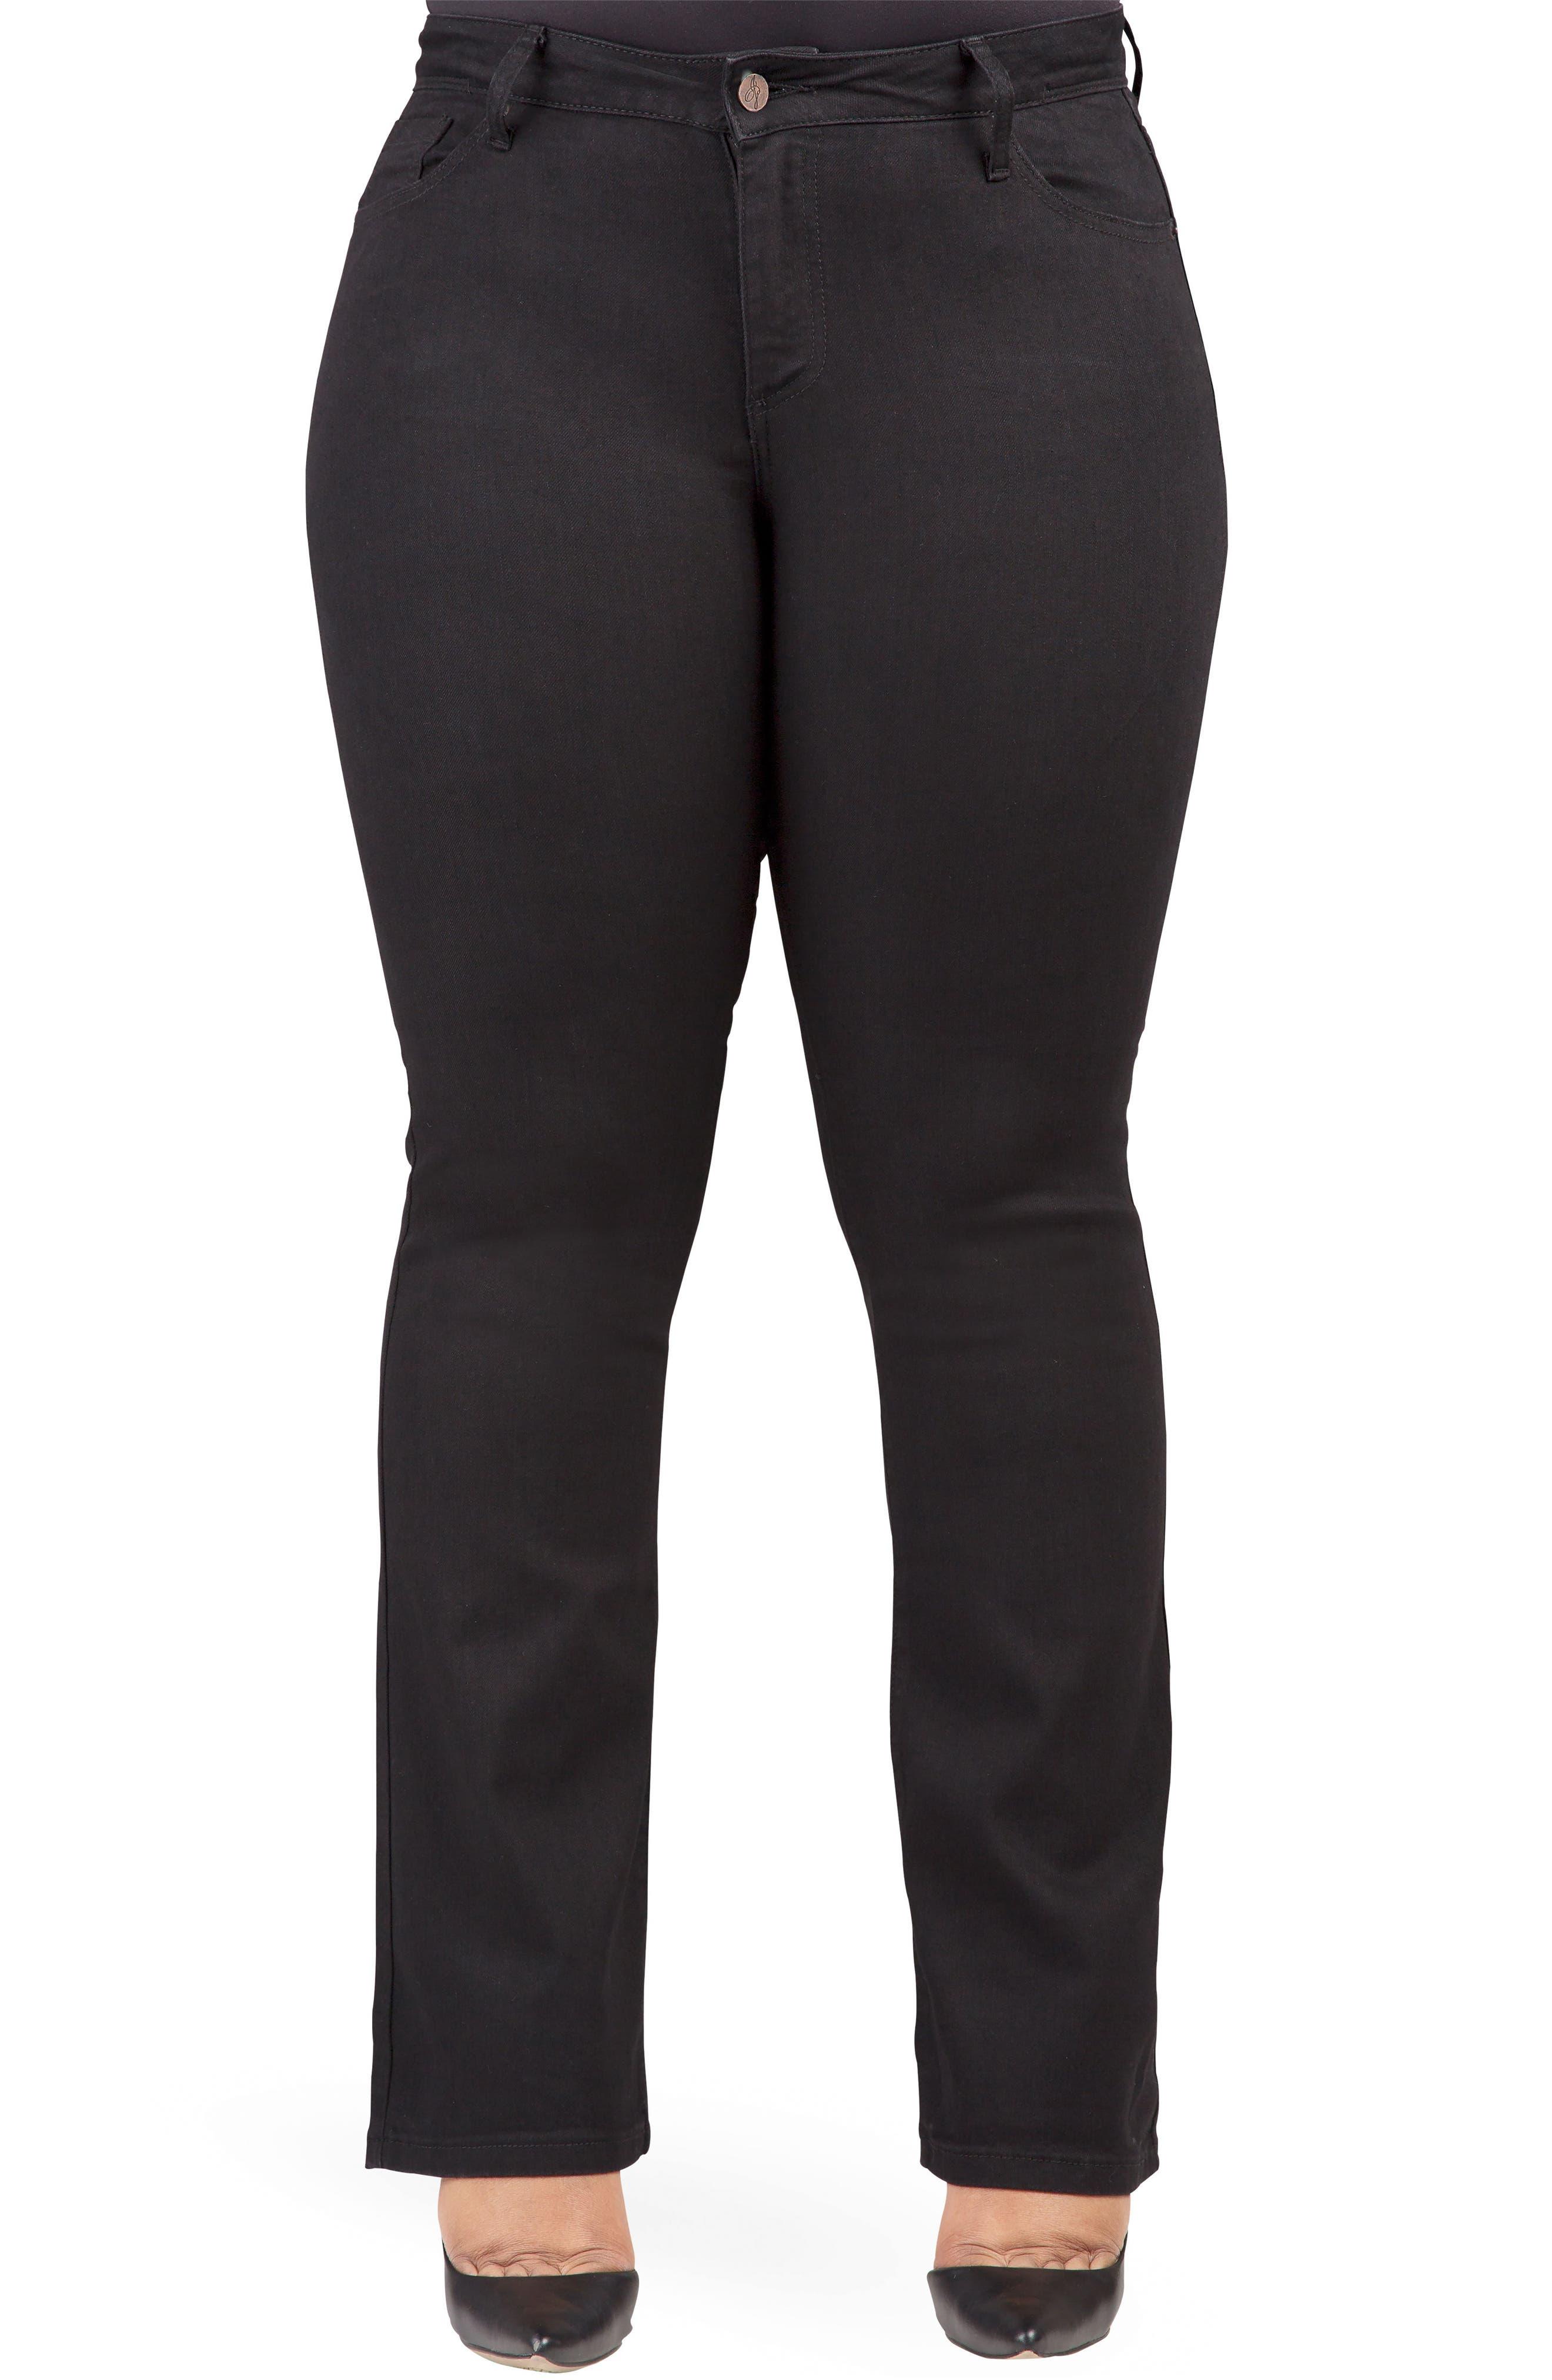 POETIC JUSTICE Scarlett Slim Bootcut Curvy Fit Jeans, Main, color, RINSE BLACK